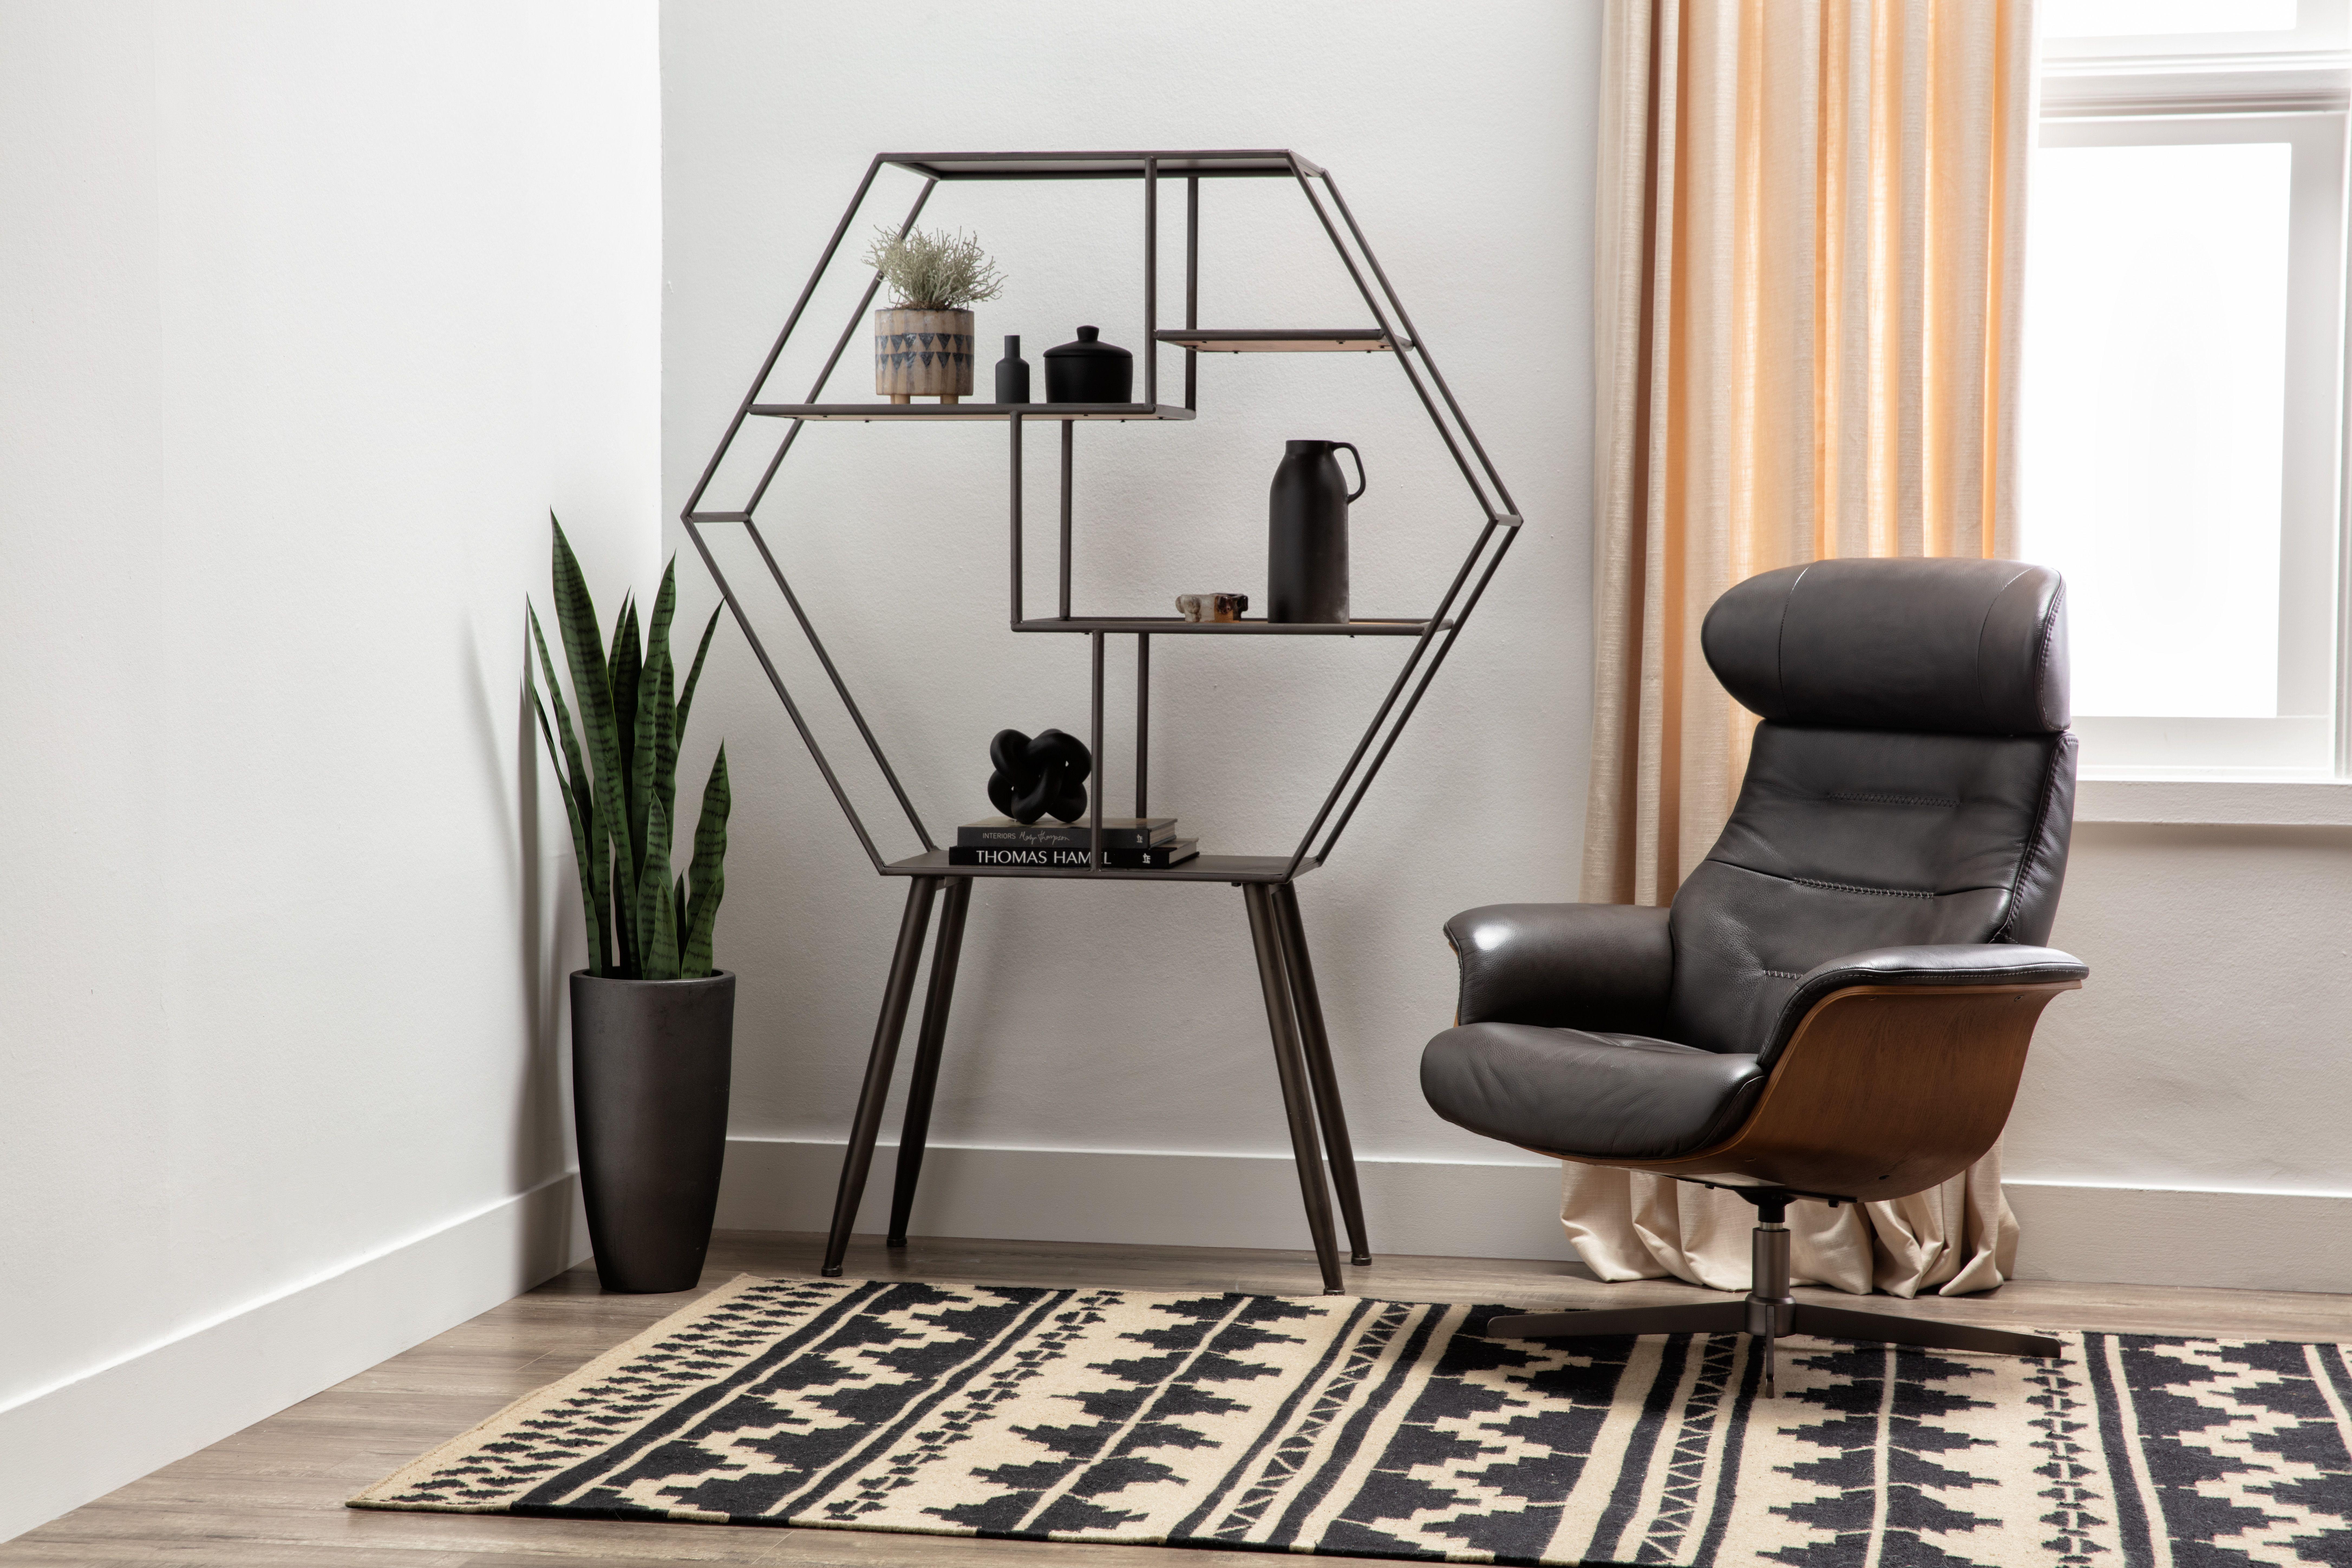 Amala dark grey leather reclining swivel chair with